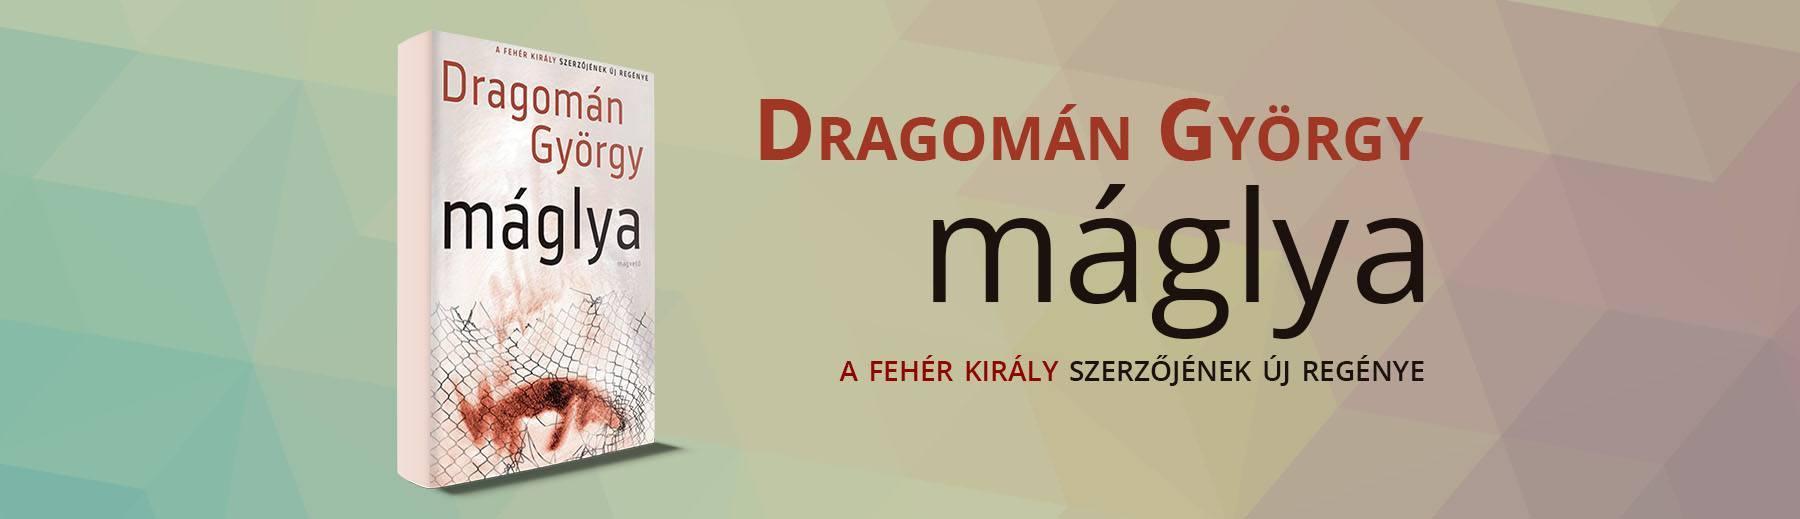 http://admin.konyvaruhaz.info/media/files/dragoman@2x.jpg